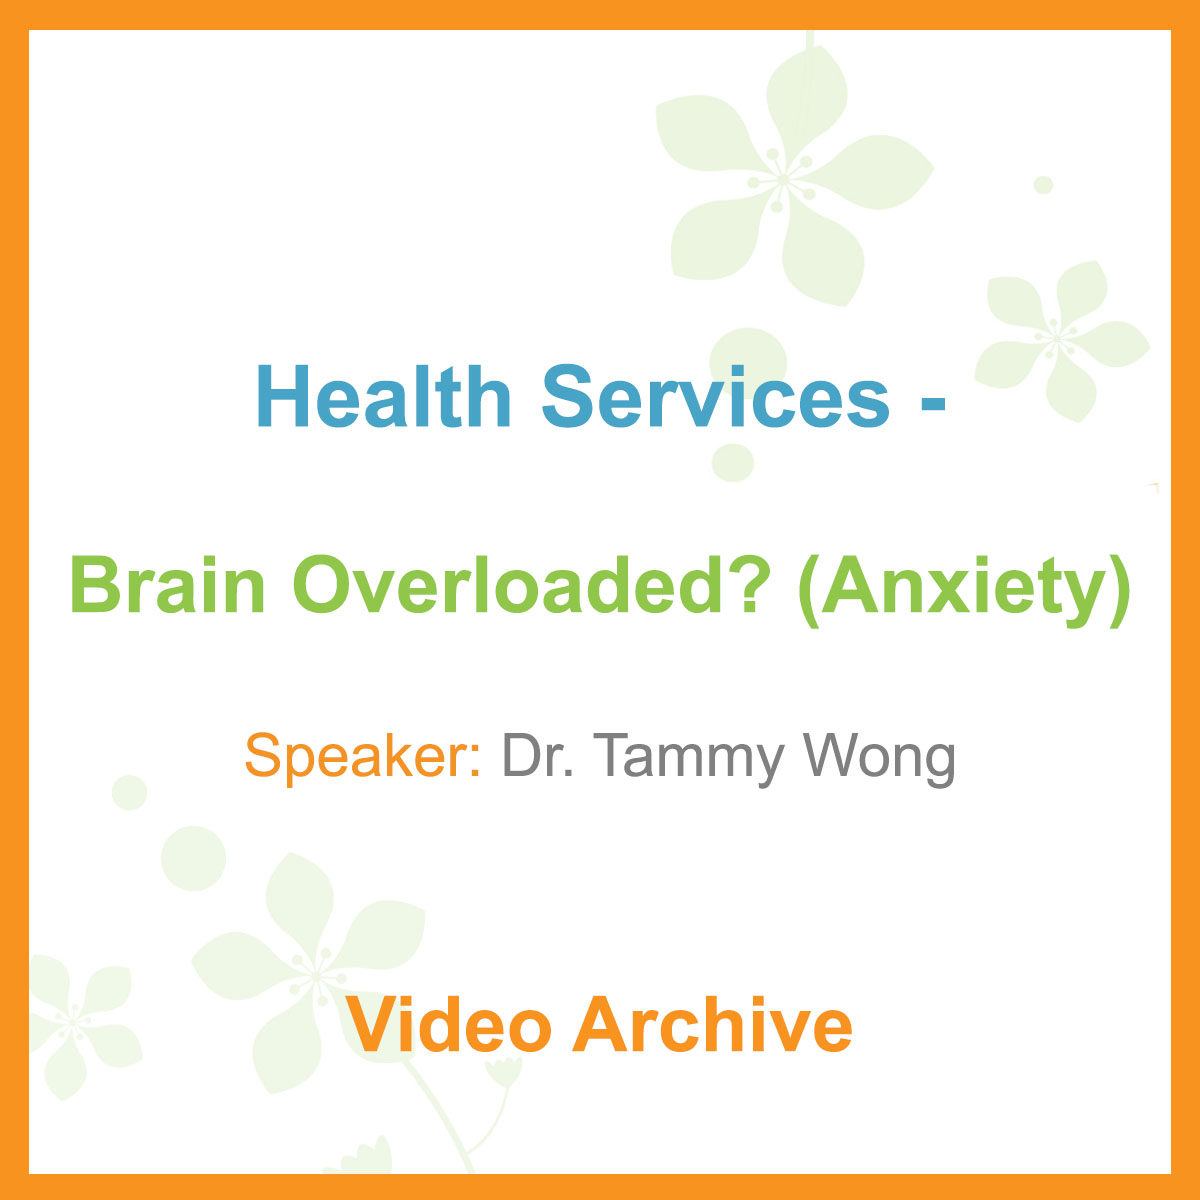 Health Talk - Brain Overloaded (Anxiety)